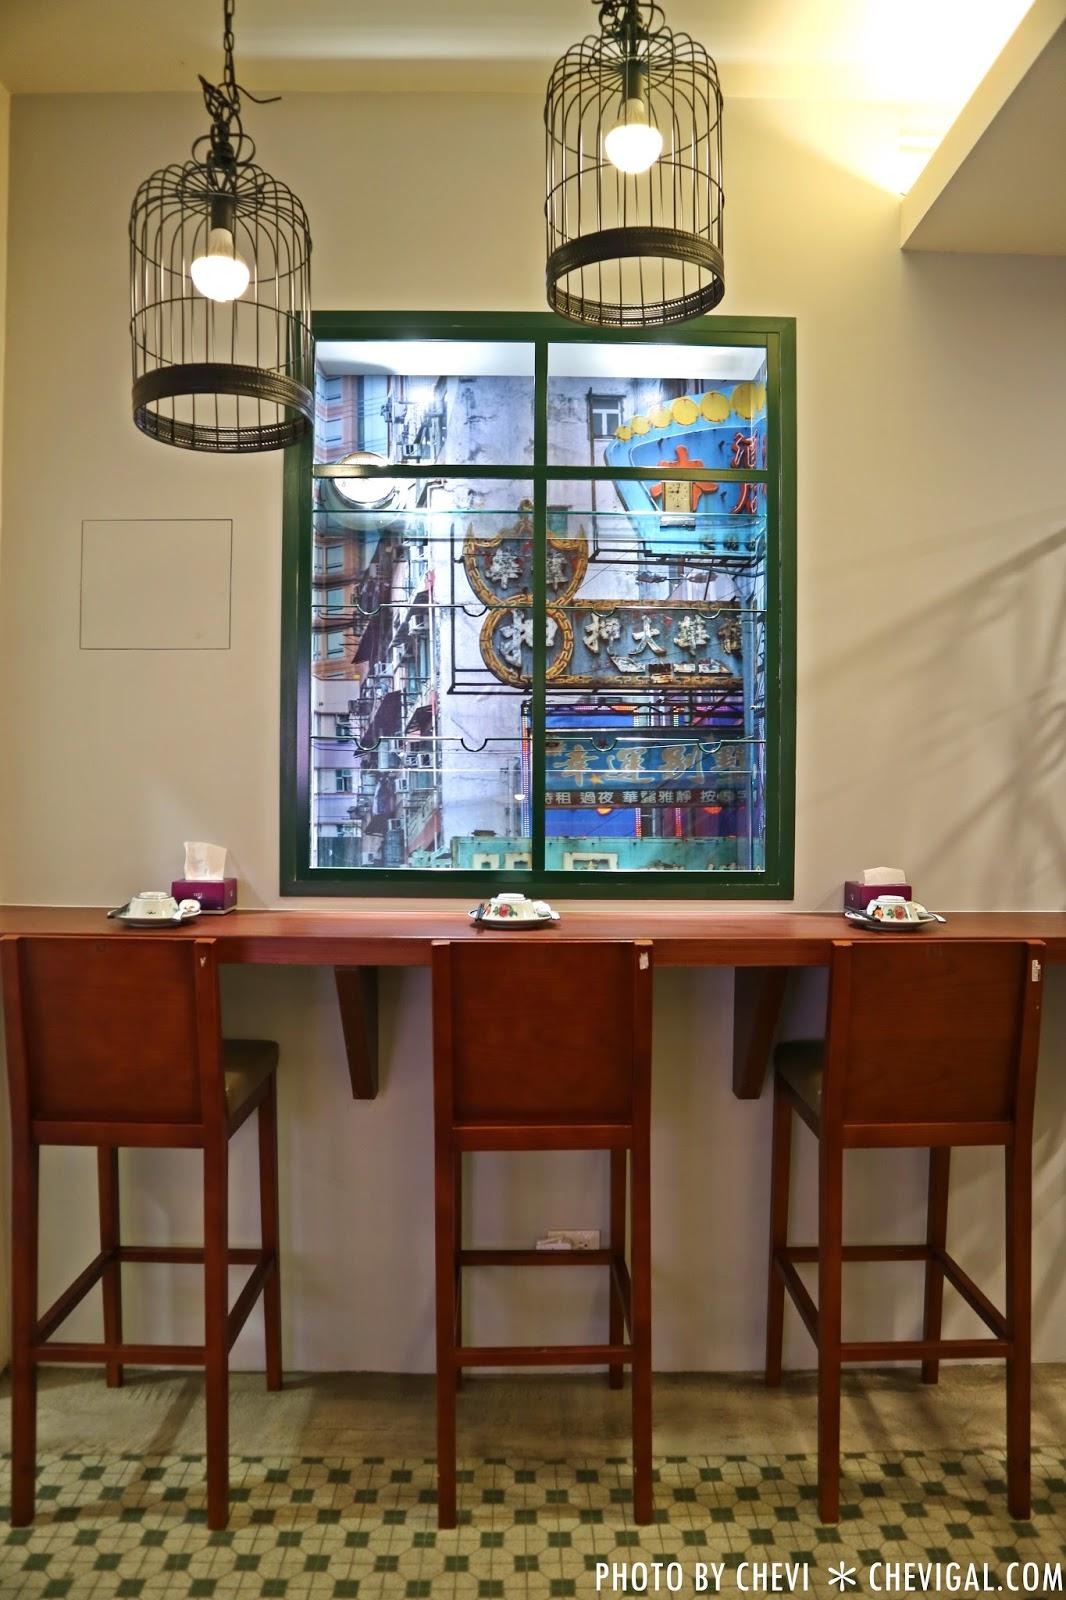 IMG 9118 - 台中西屯│帥鍋冰室*台中第一間香港冰室新開幕。道地港式餐點風味搬來台灣囉